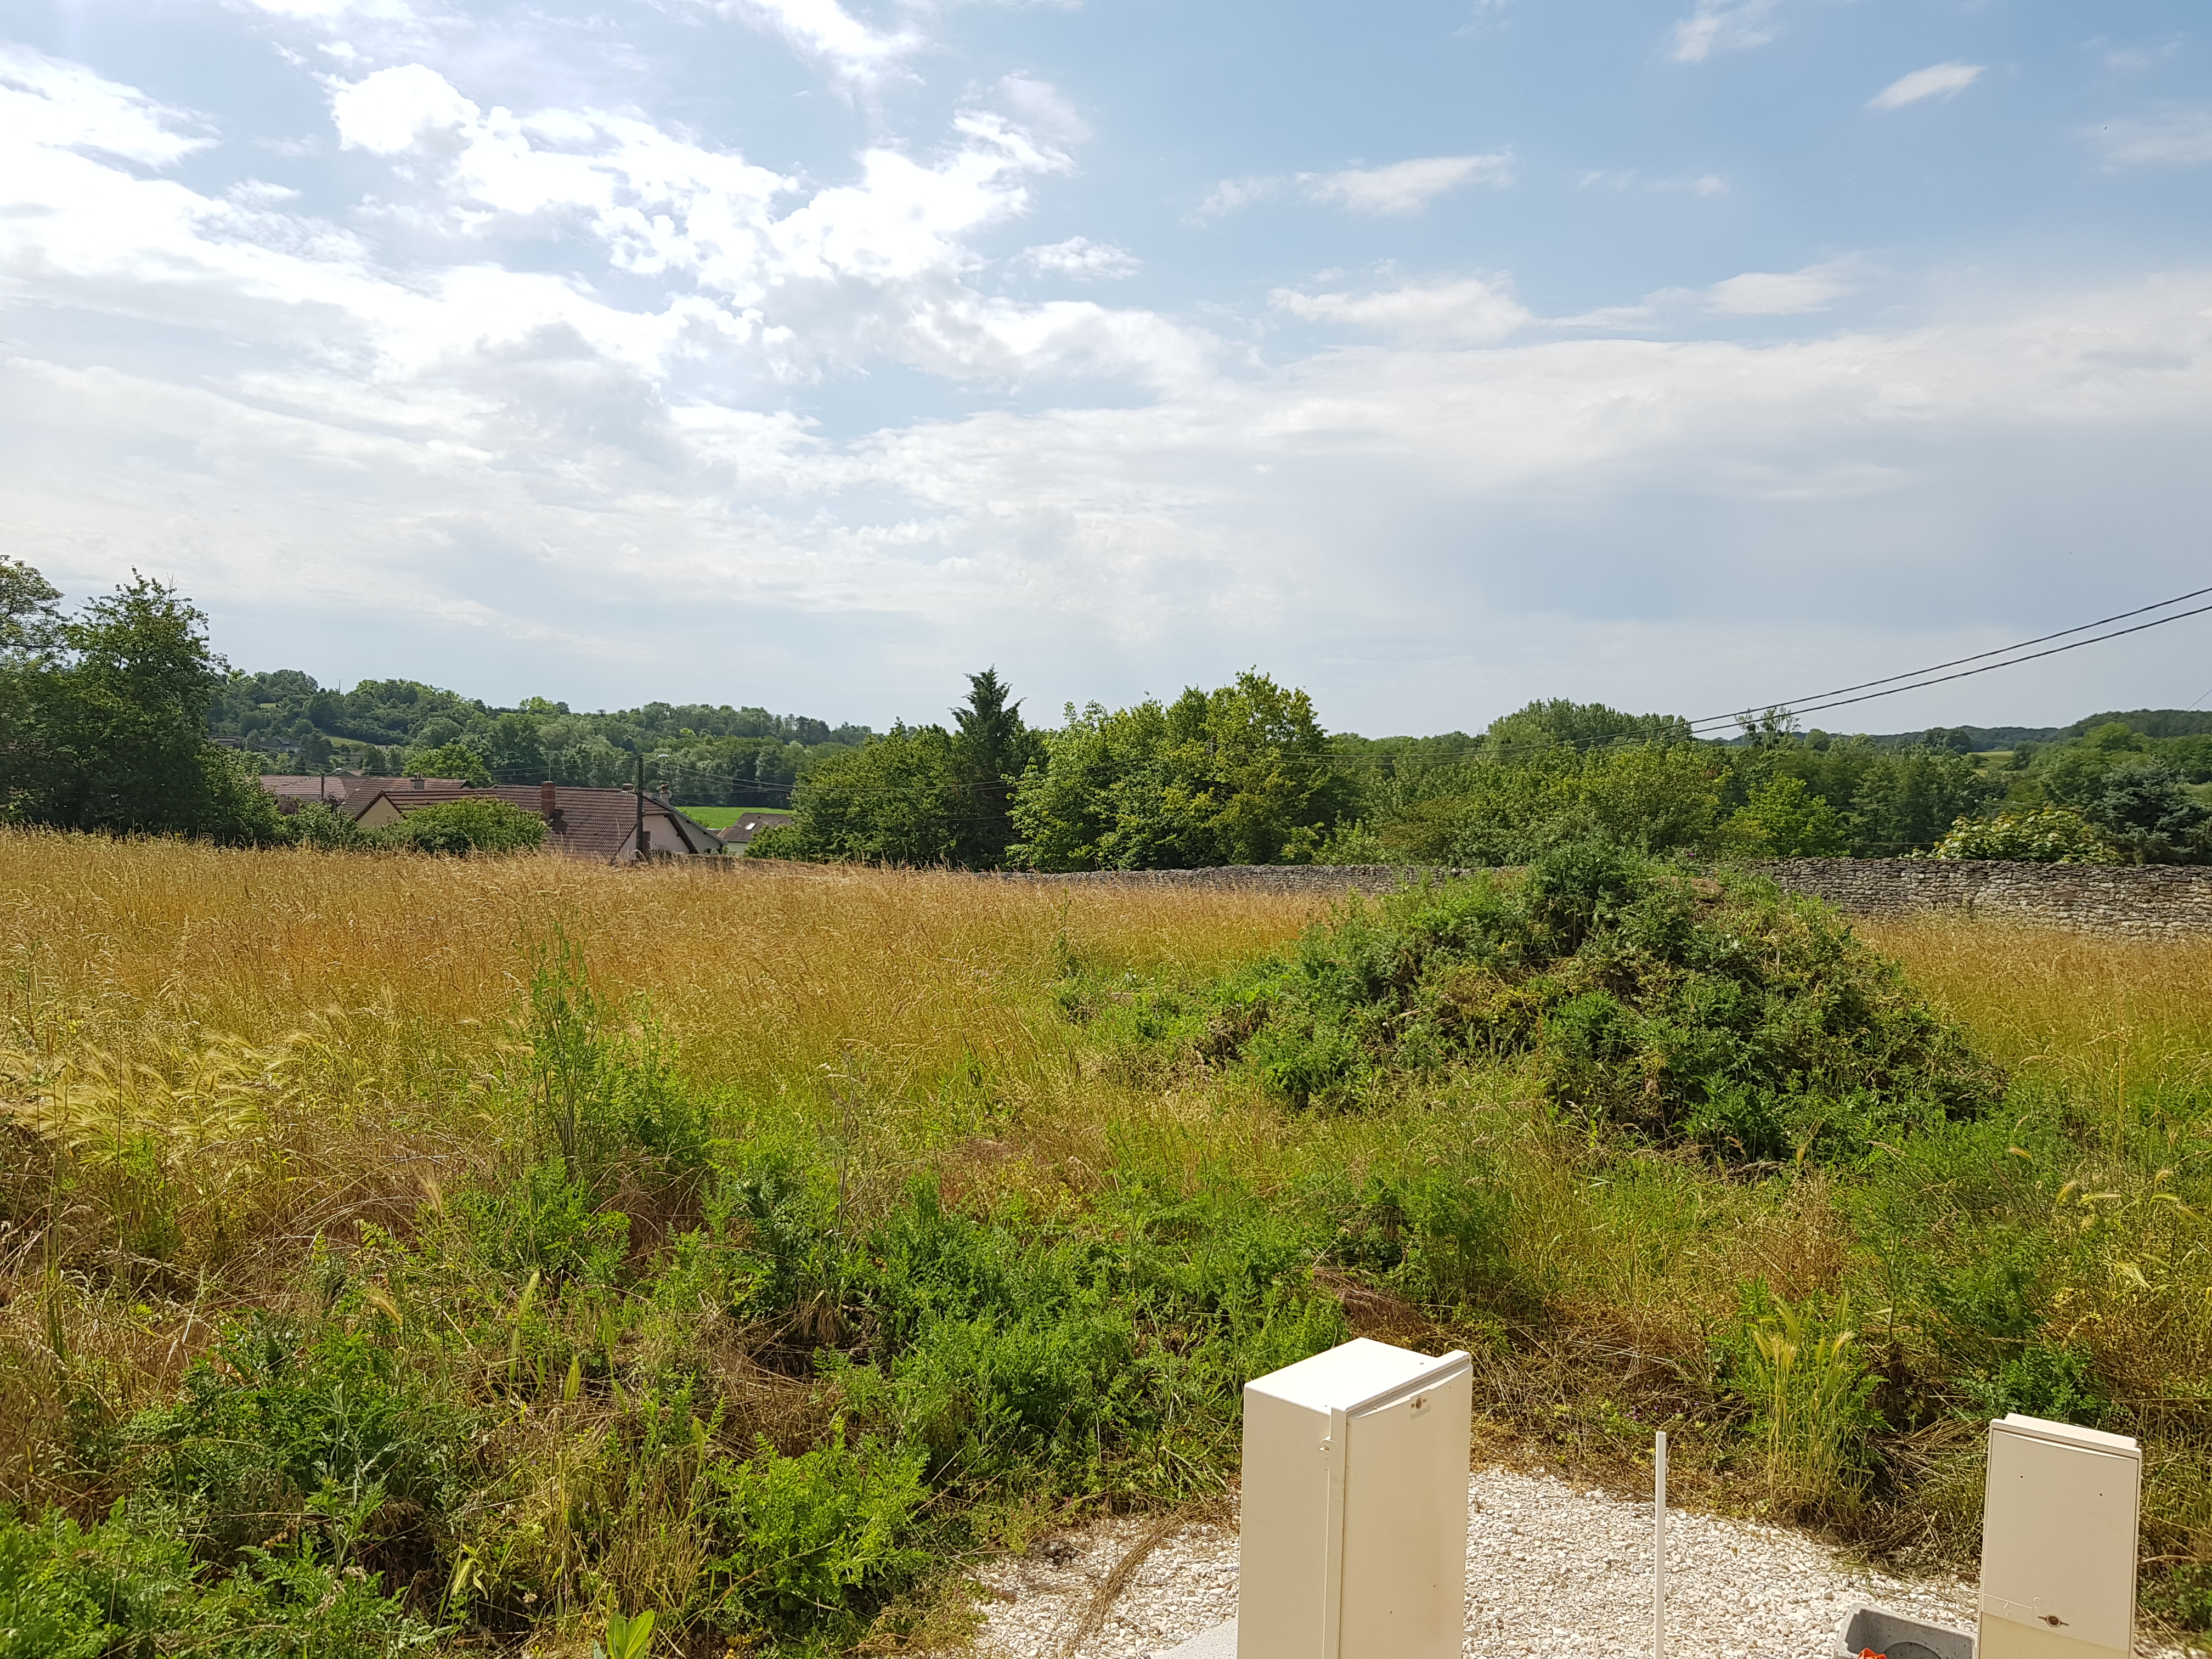 Terrain constructible à Chargey-lès-Gray